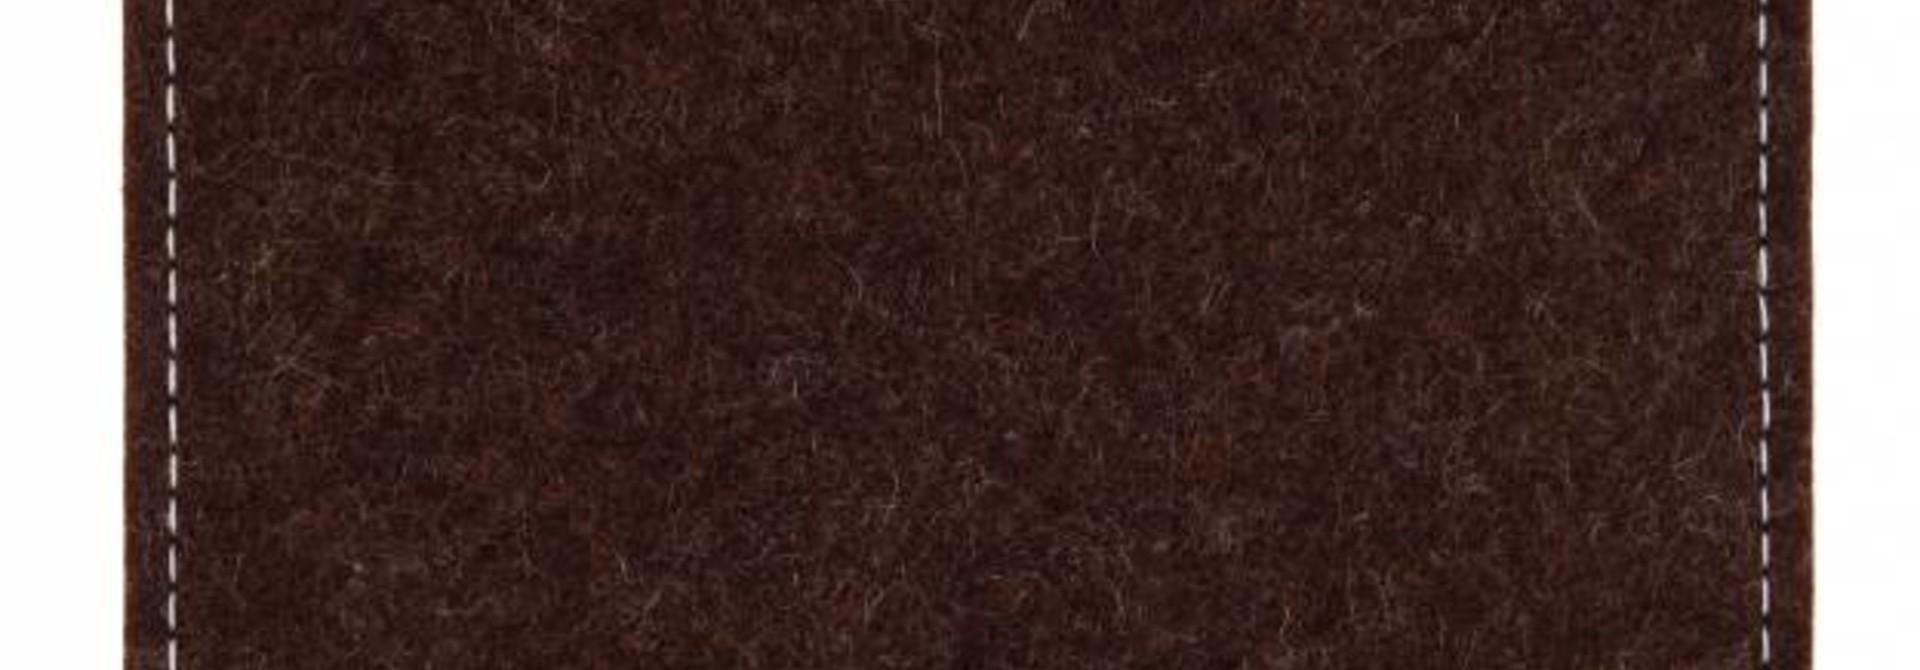 Tab Sleeve Truffle-Brown